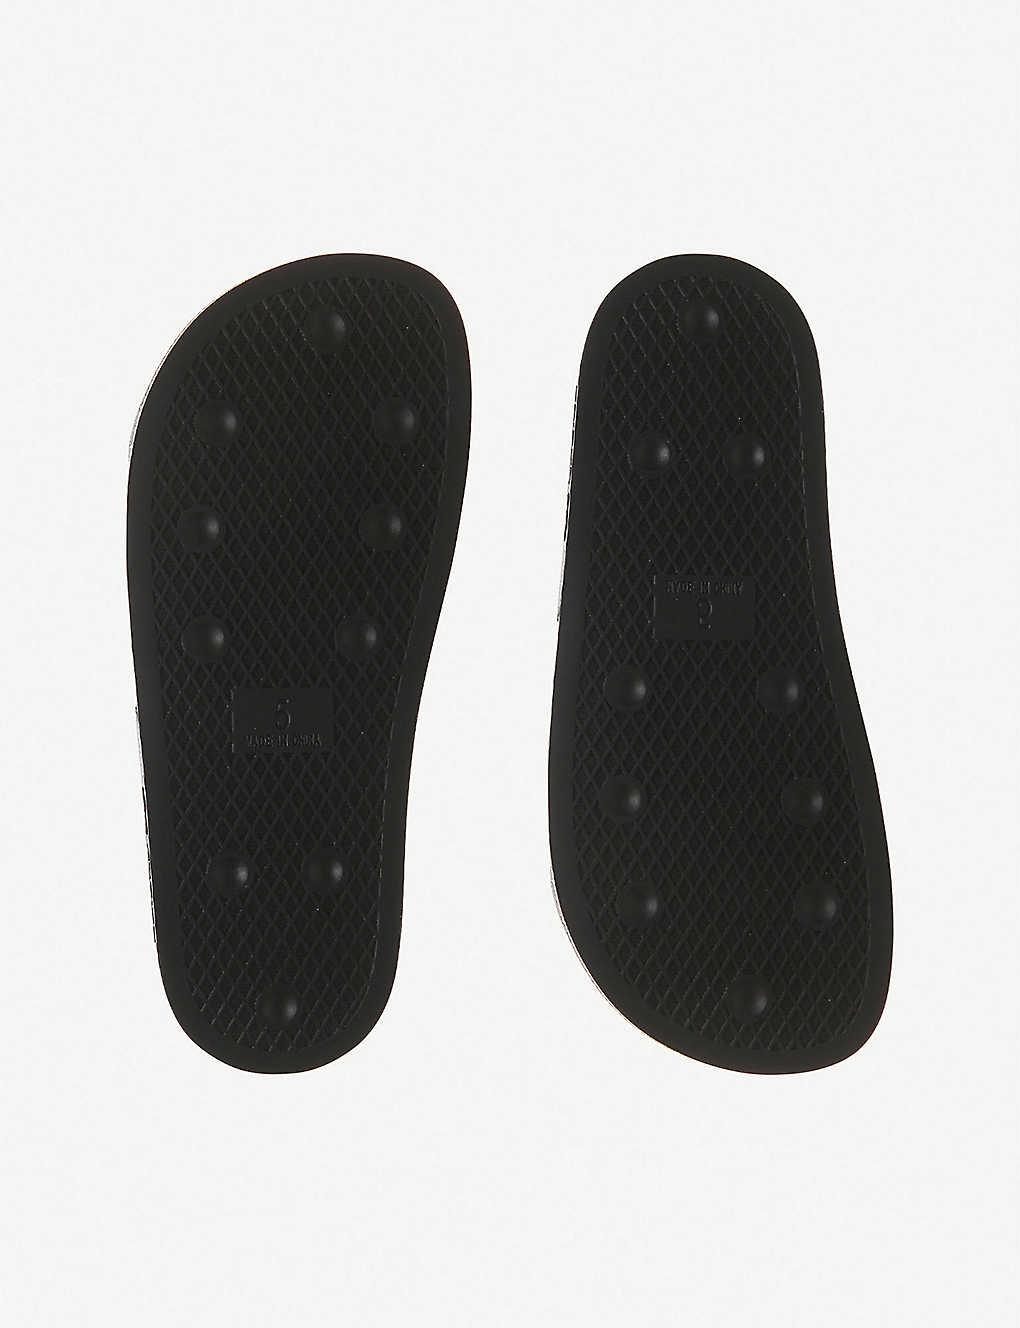 049d53461 ... Adilette sliders - Black iridescent